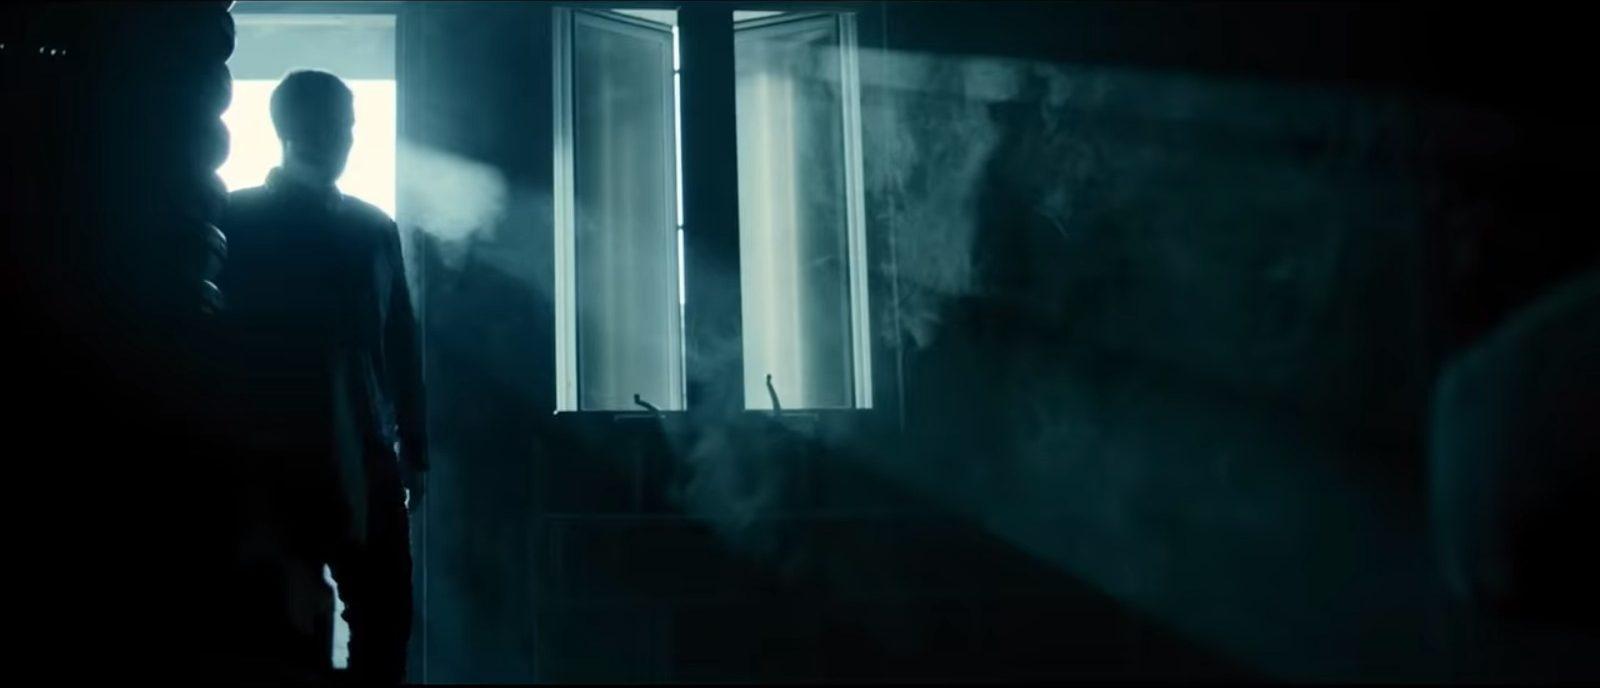 Ty Brasel Drops Praying Hands II Video